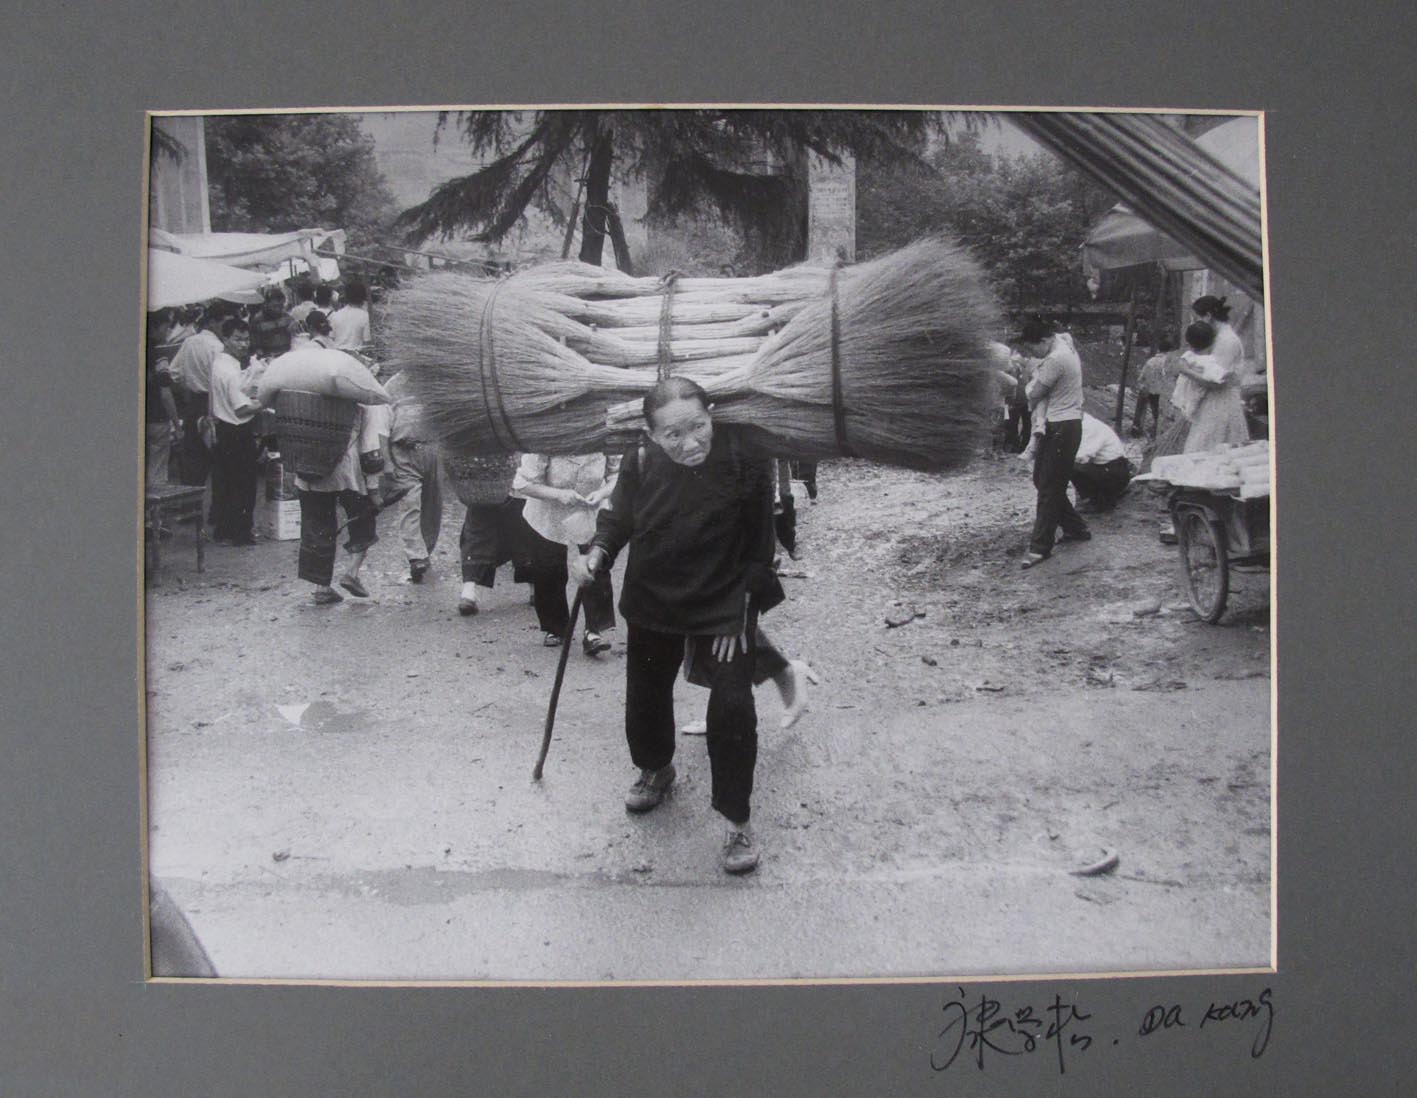 DA KANG. - Miao. Older man with straw-bale.